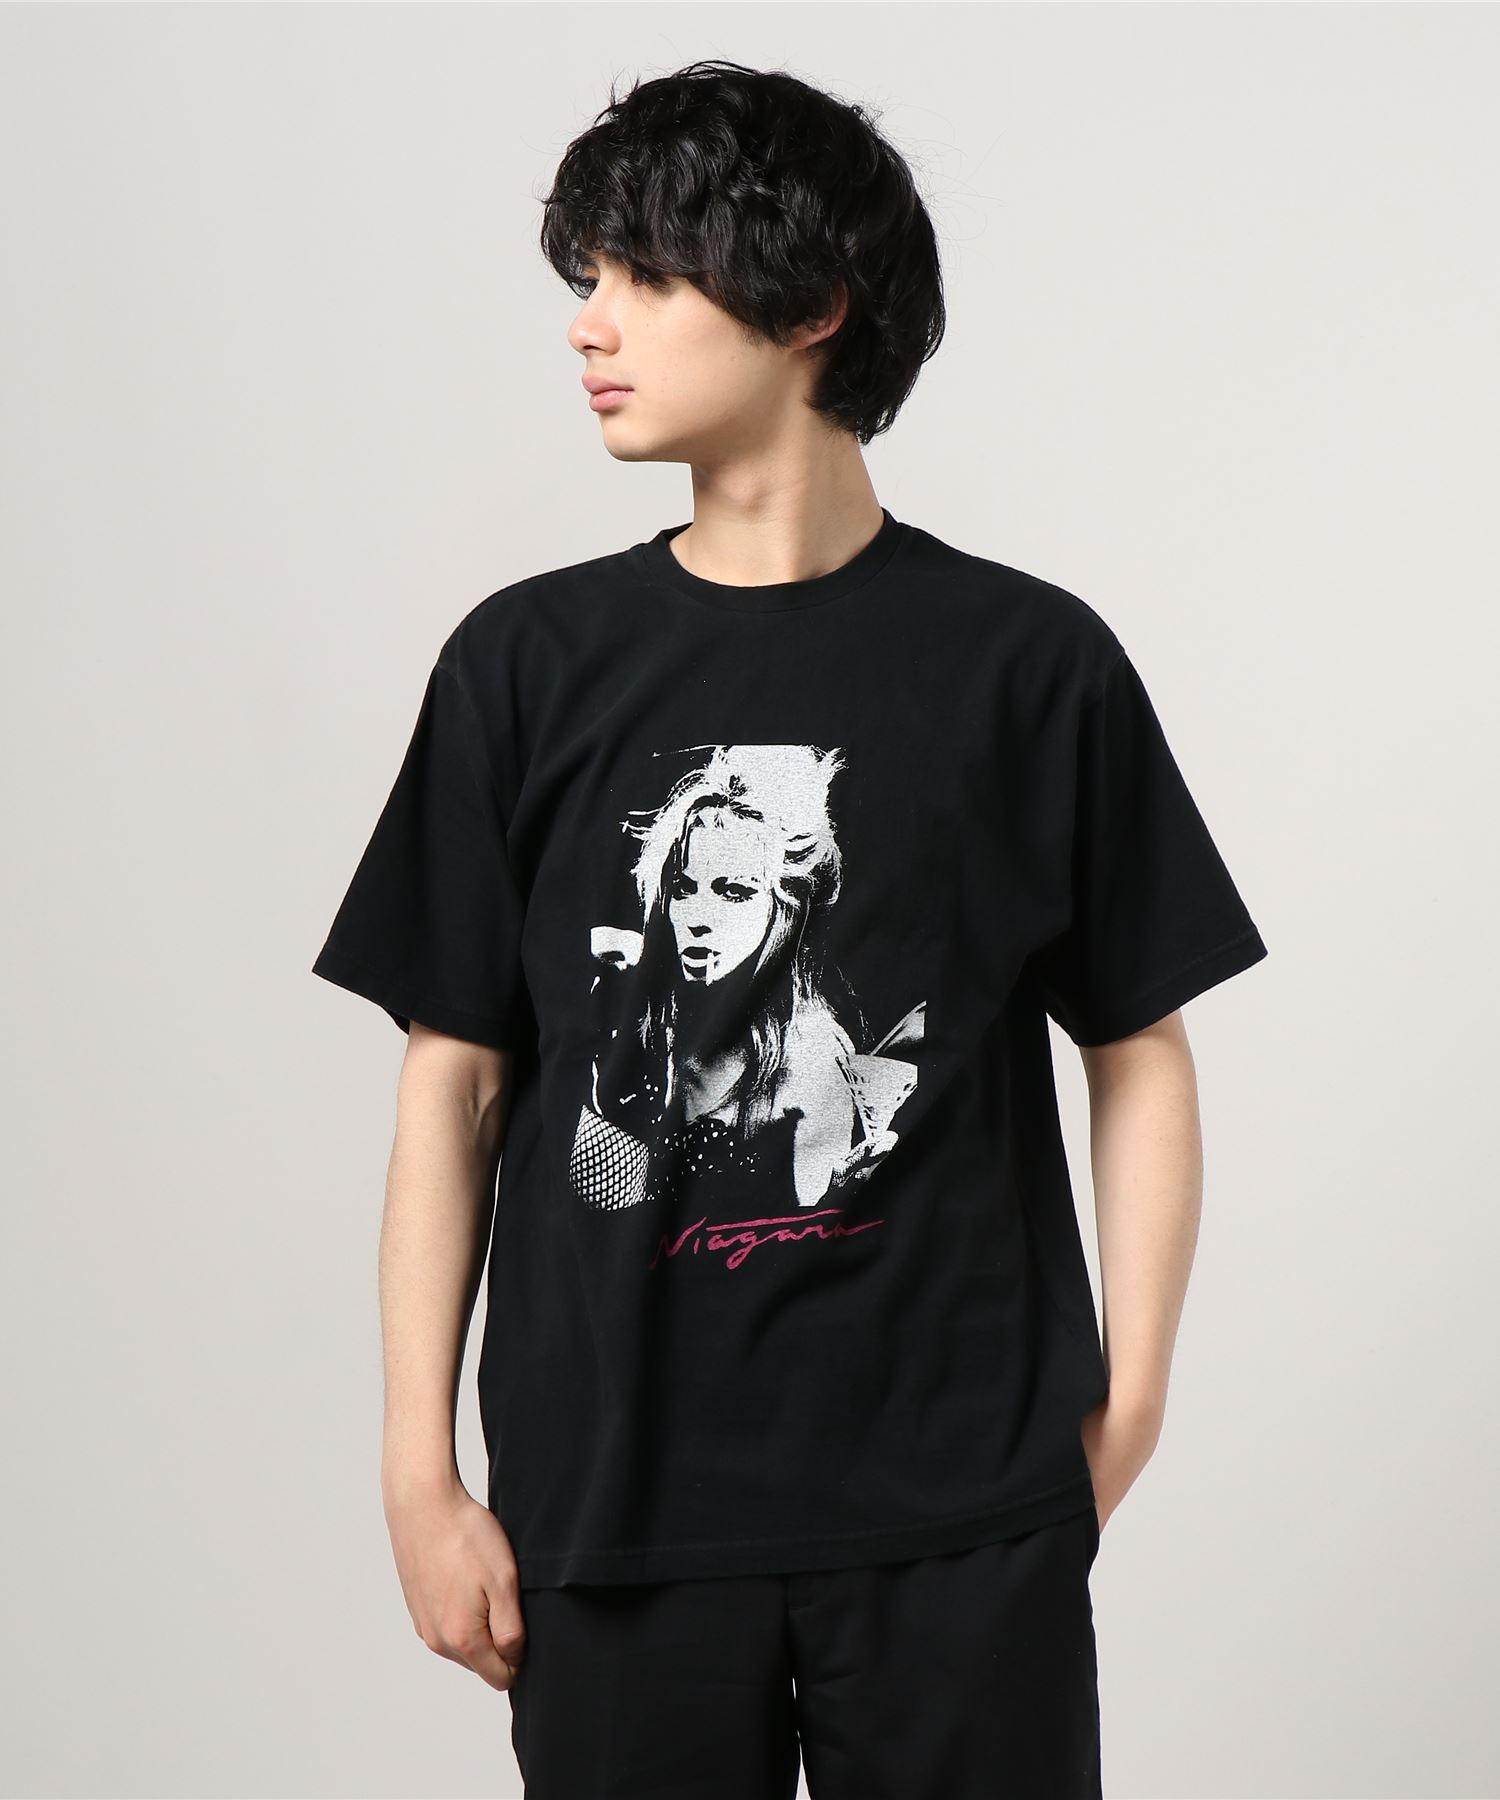 NIAGARA/FASTER NIAGARA Tシャツ